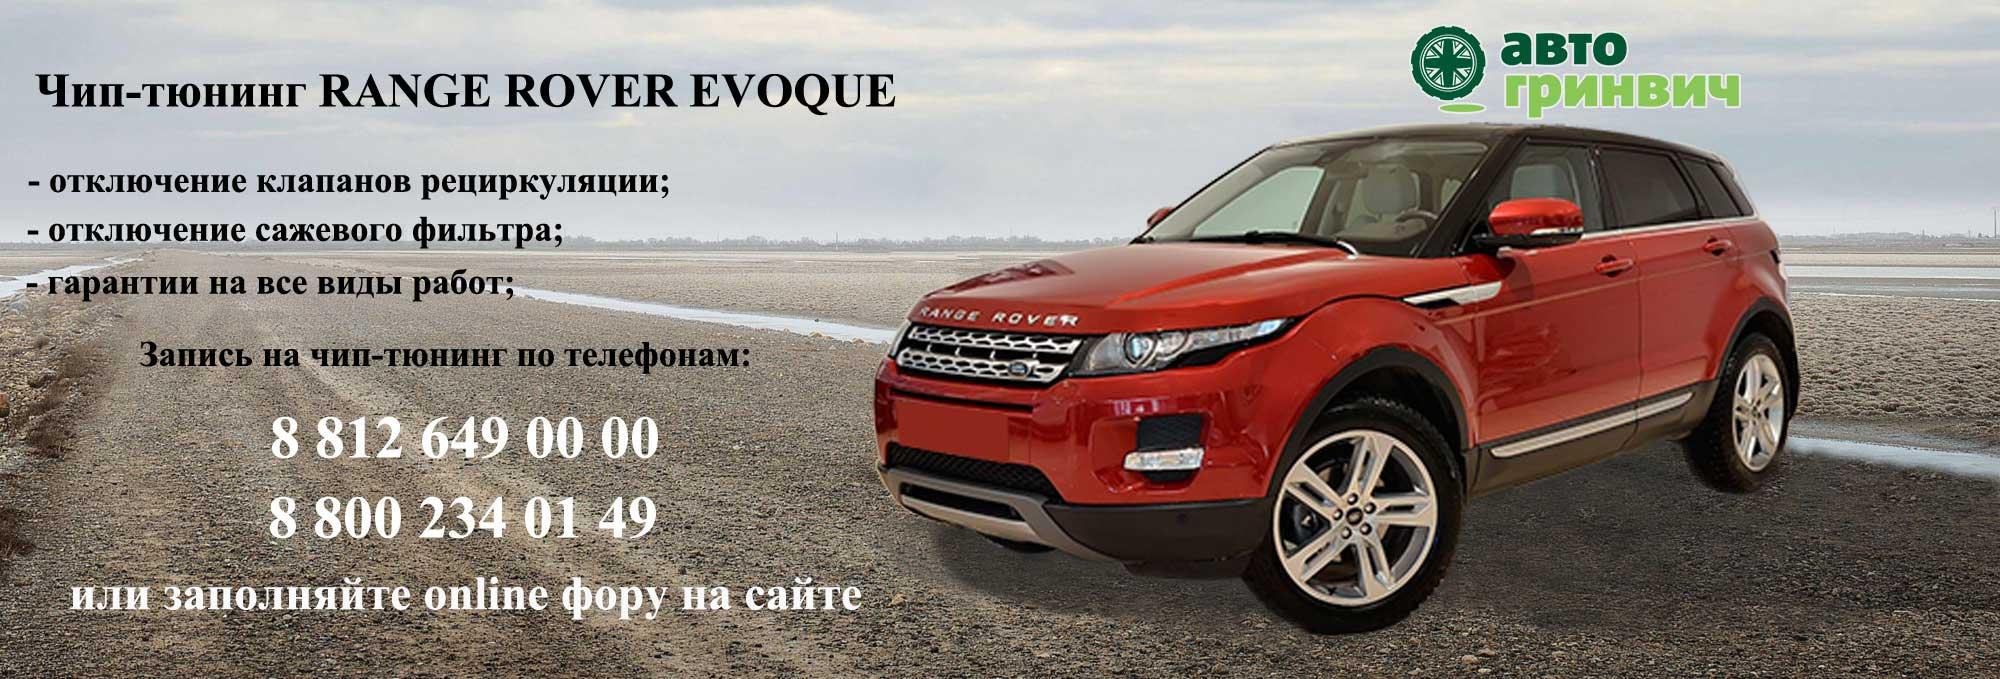 Чип-тюнинг Range Rover Evoque